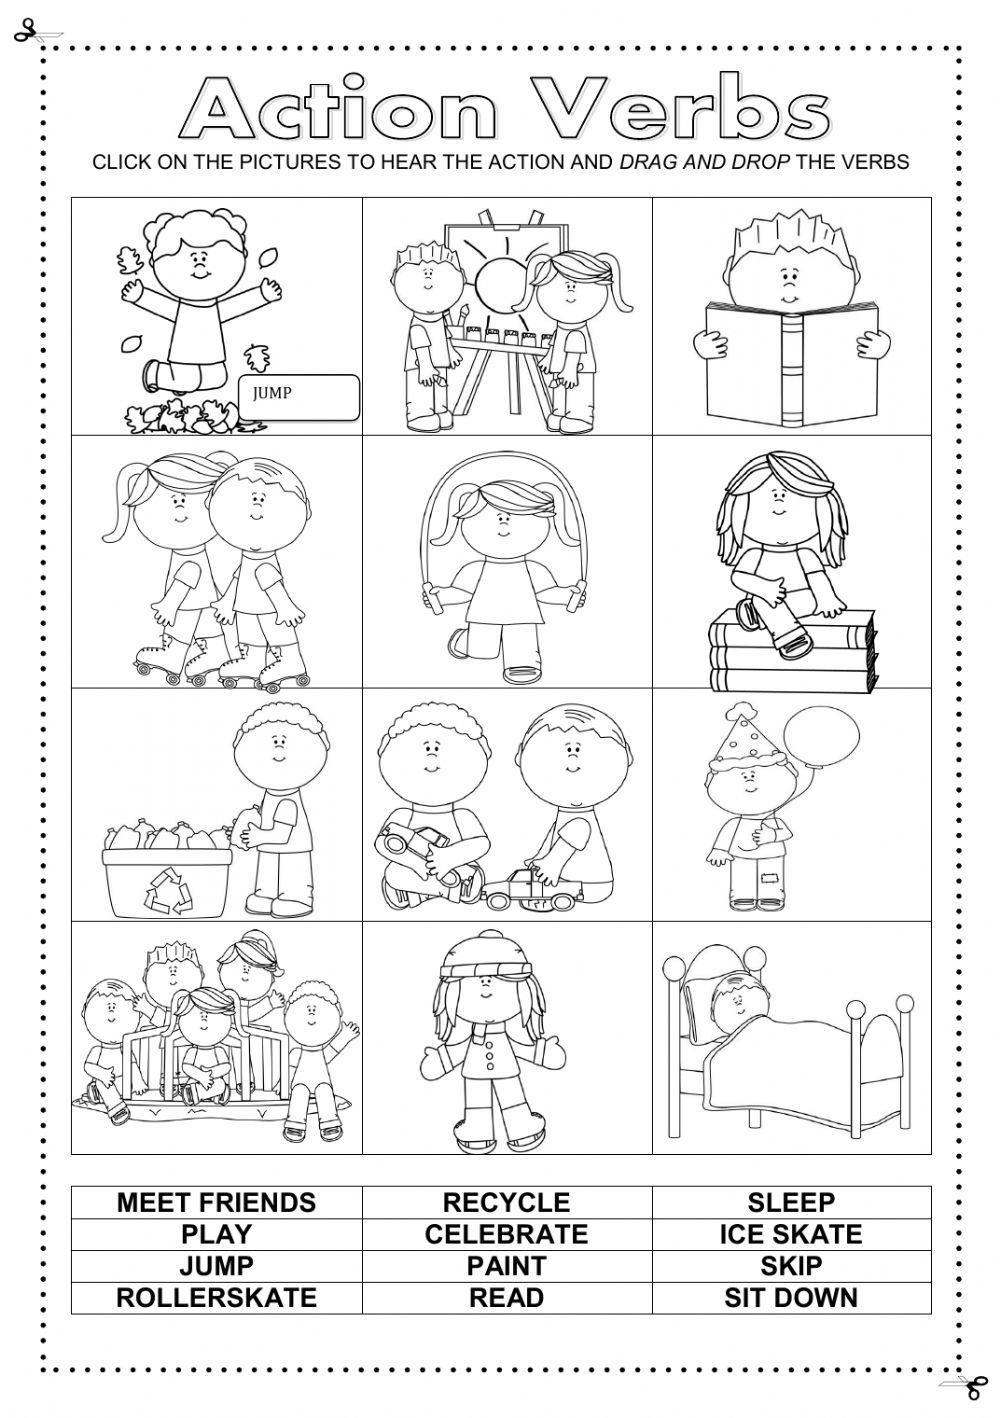 Worksheets Recycling For Kids Worksheets verbs for kids worksheets